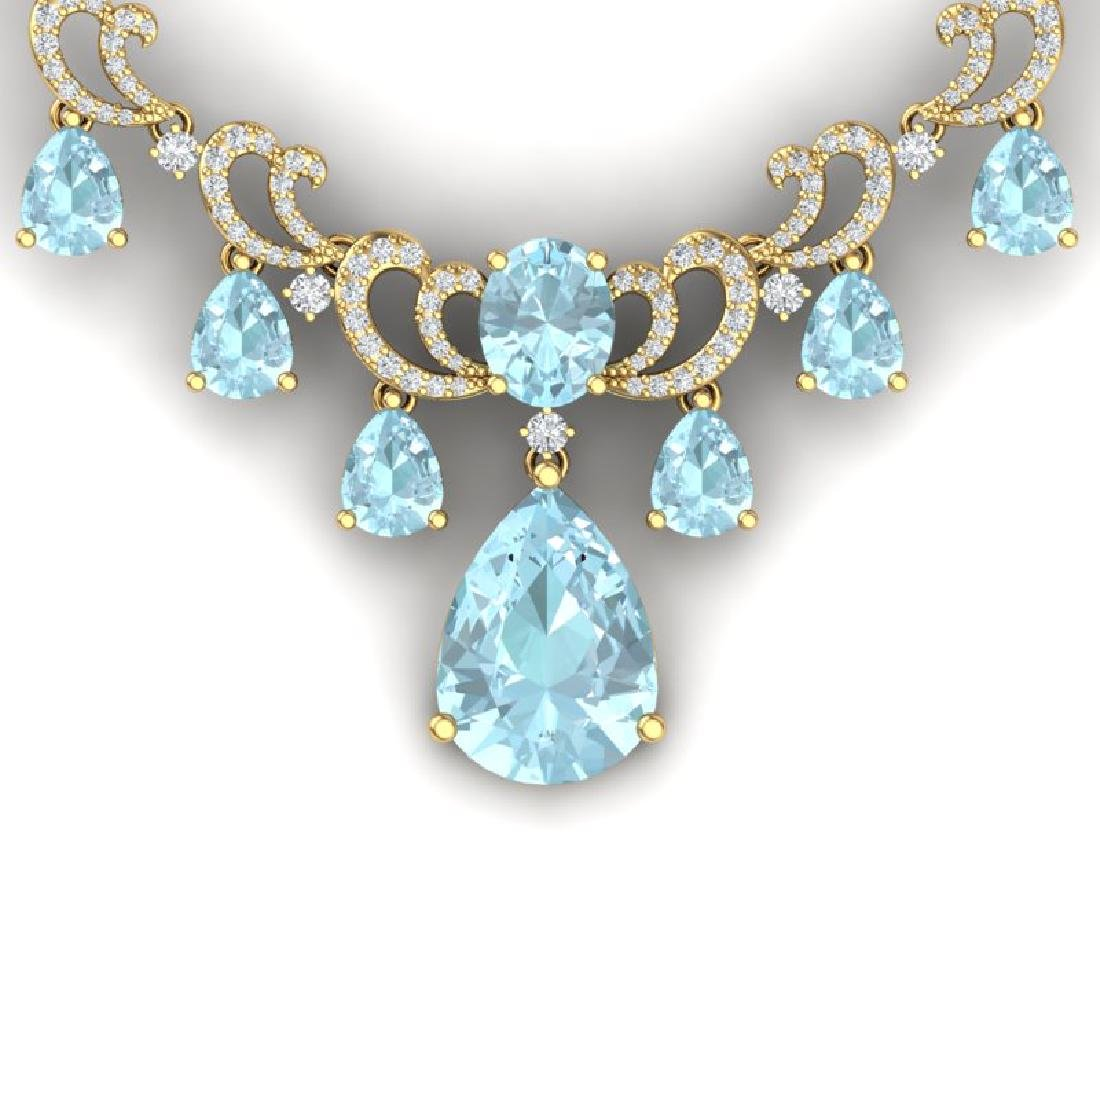 34.69 CTW Royalty Sky Topaz & VS Diamond Necklace 18K